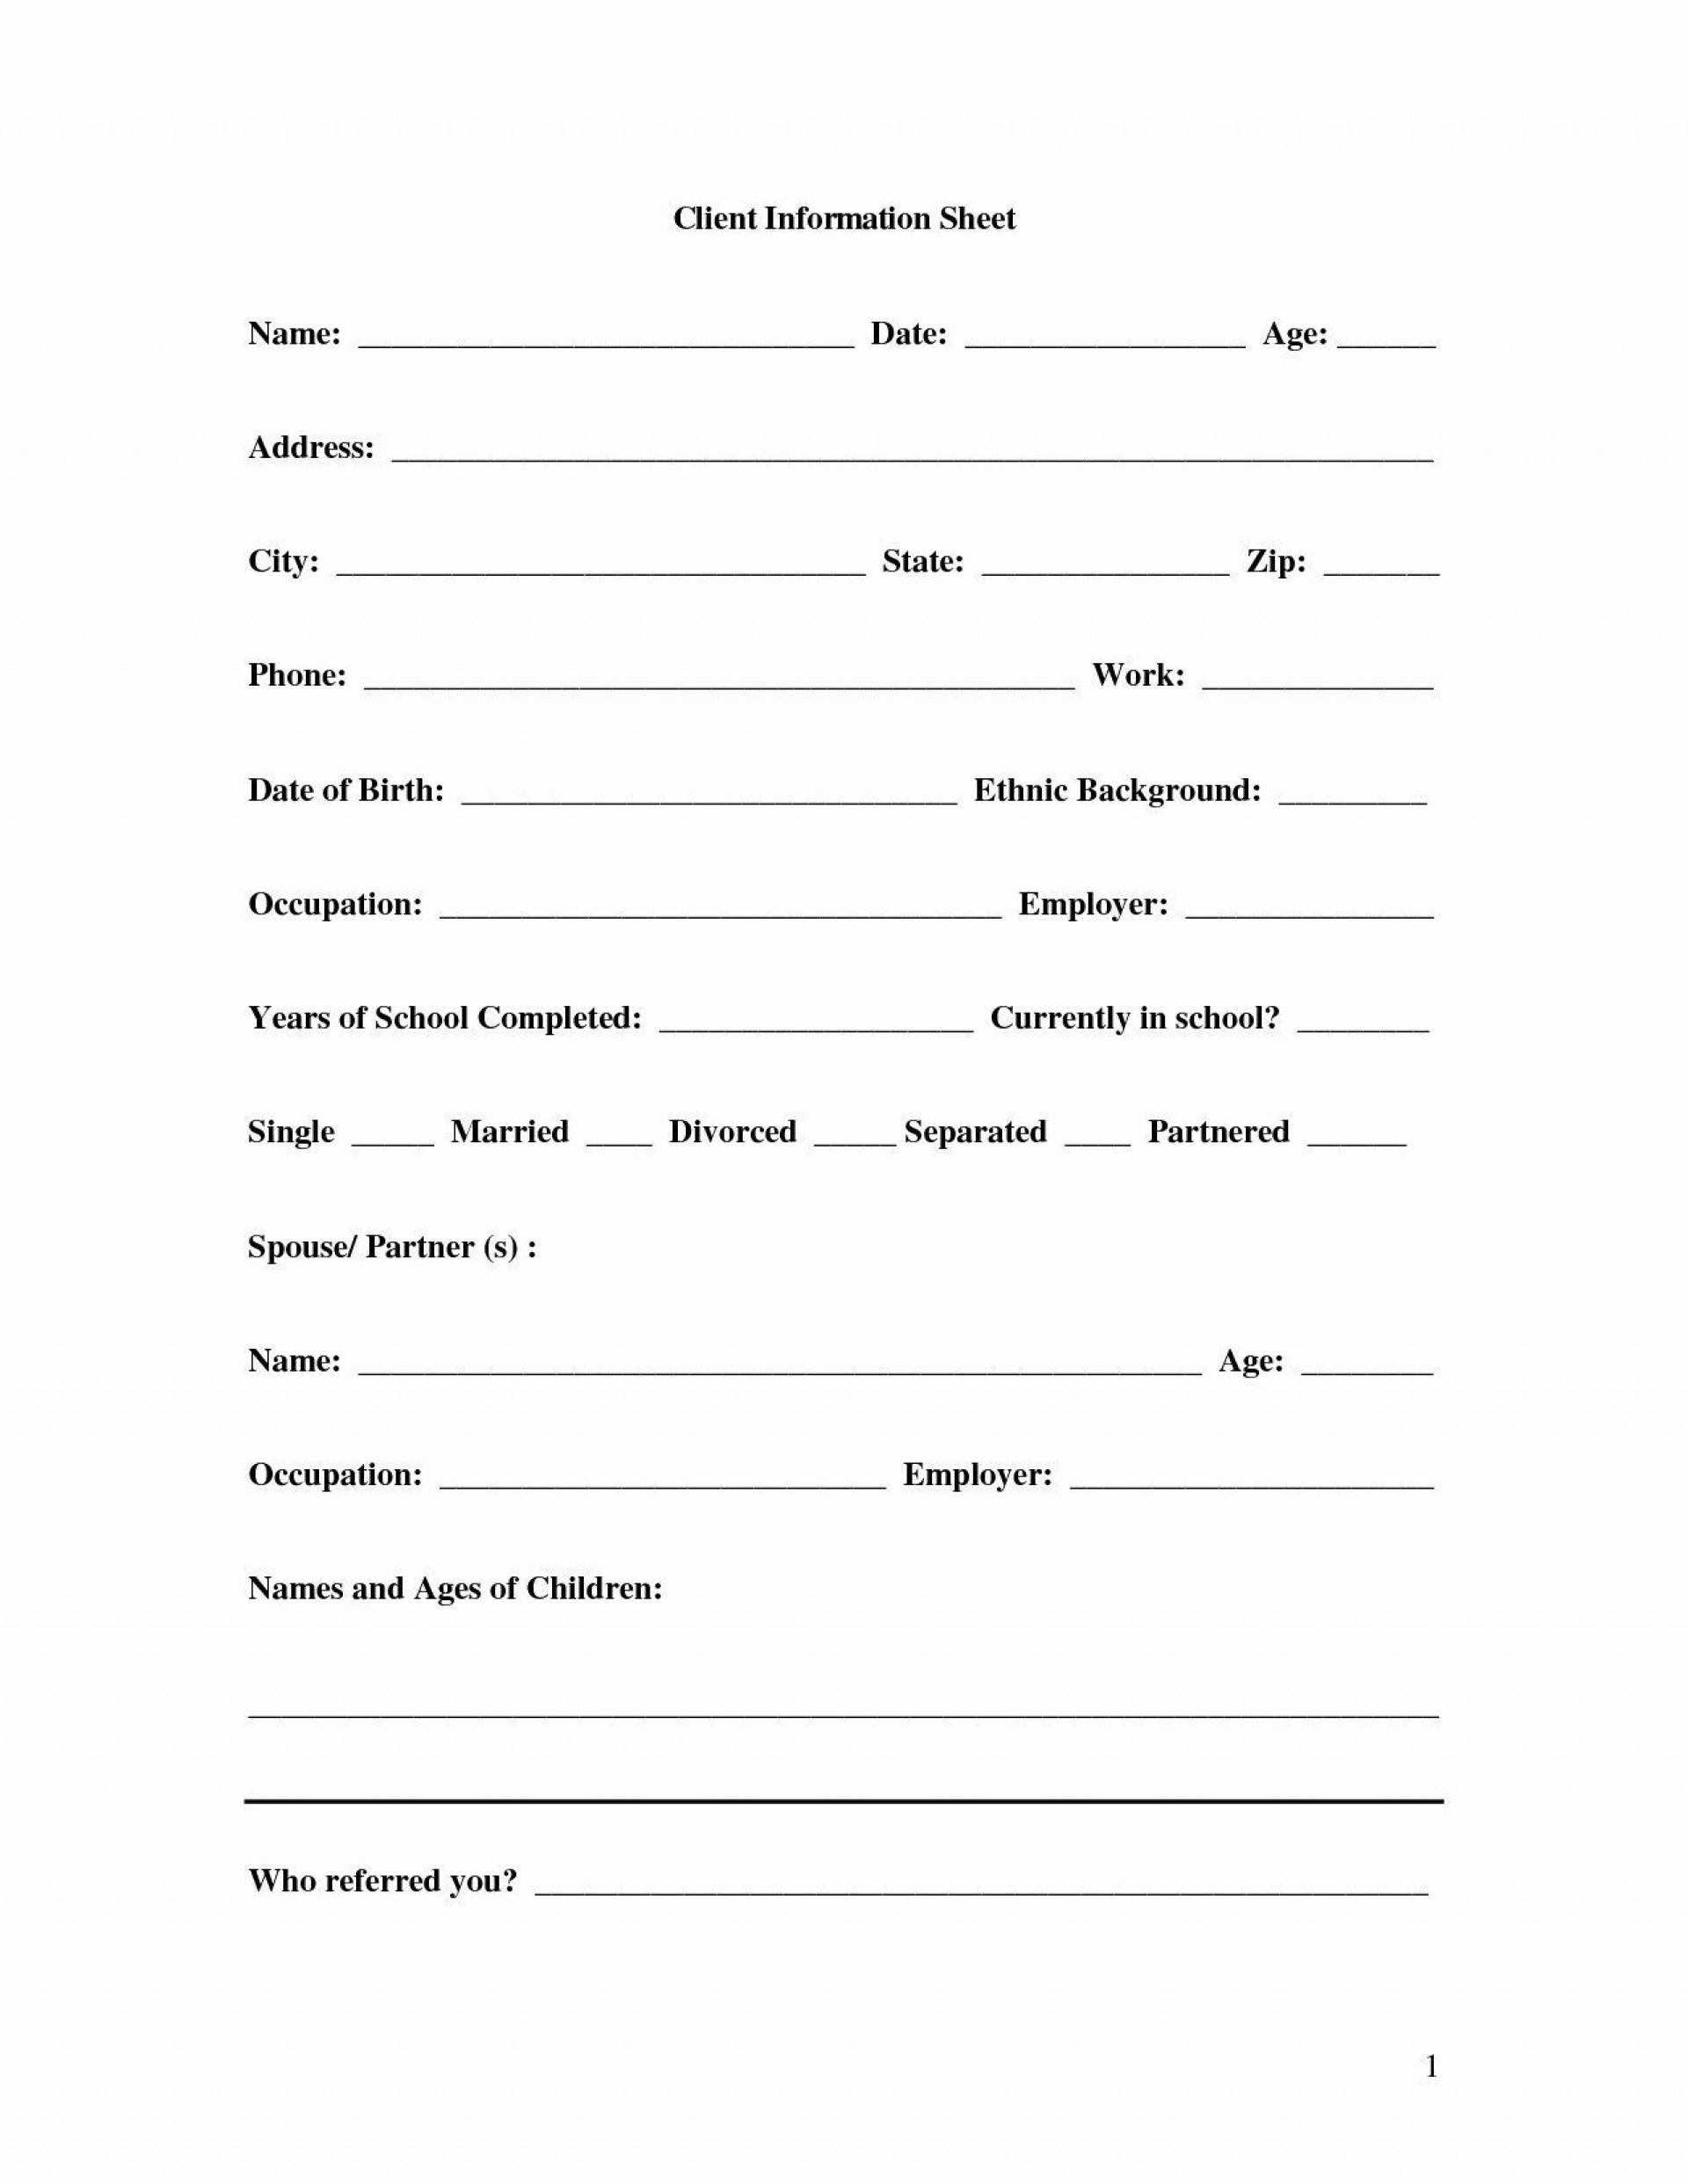 004 Unusual New Customer Form Template Word Photo  Registration Account Feedback1920